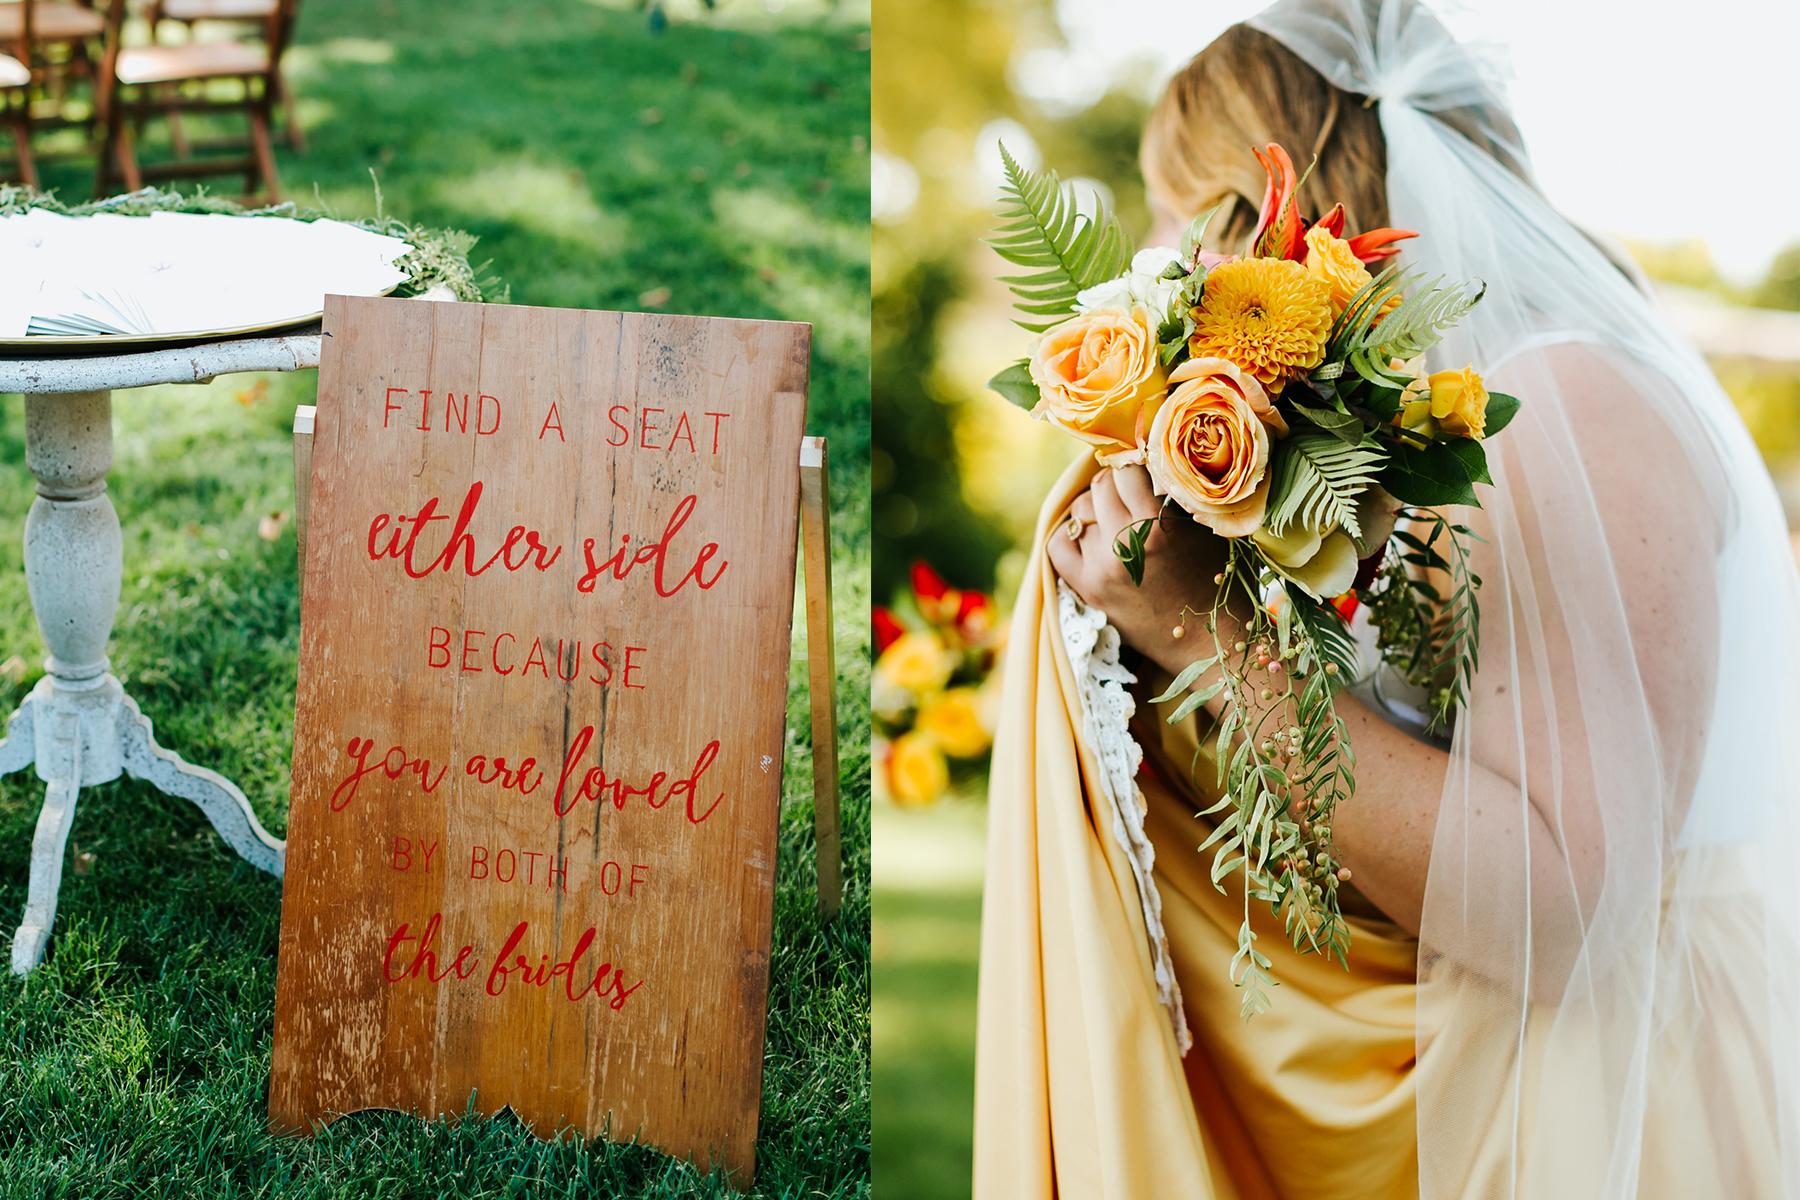 terrain+at+styers+gay+wedding+florist+colly+flowers2.jpg